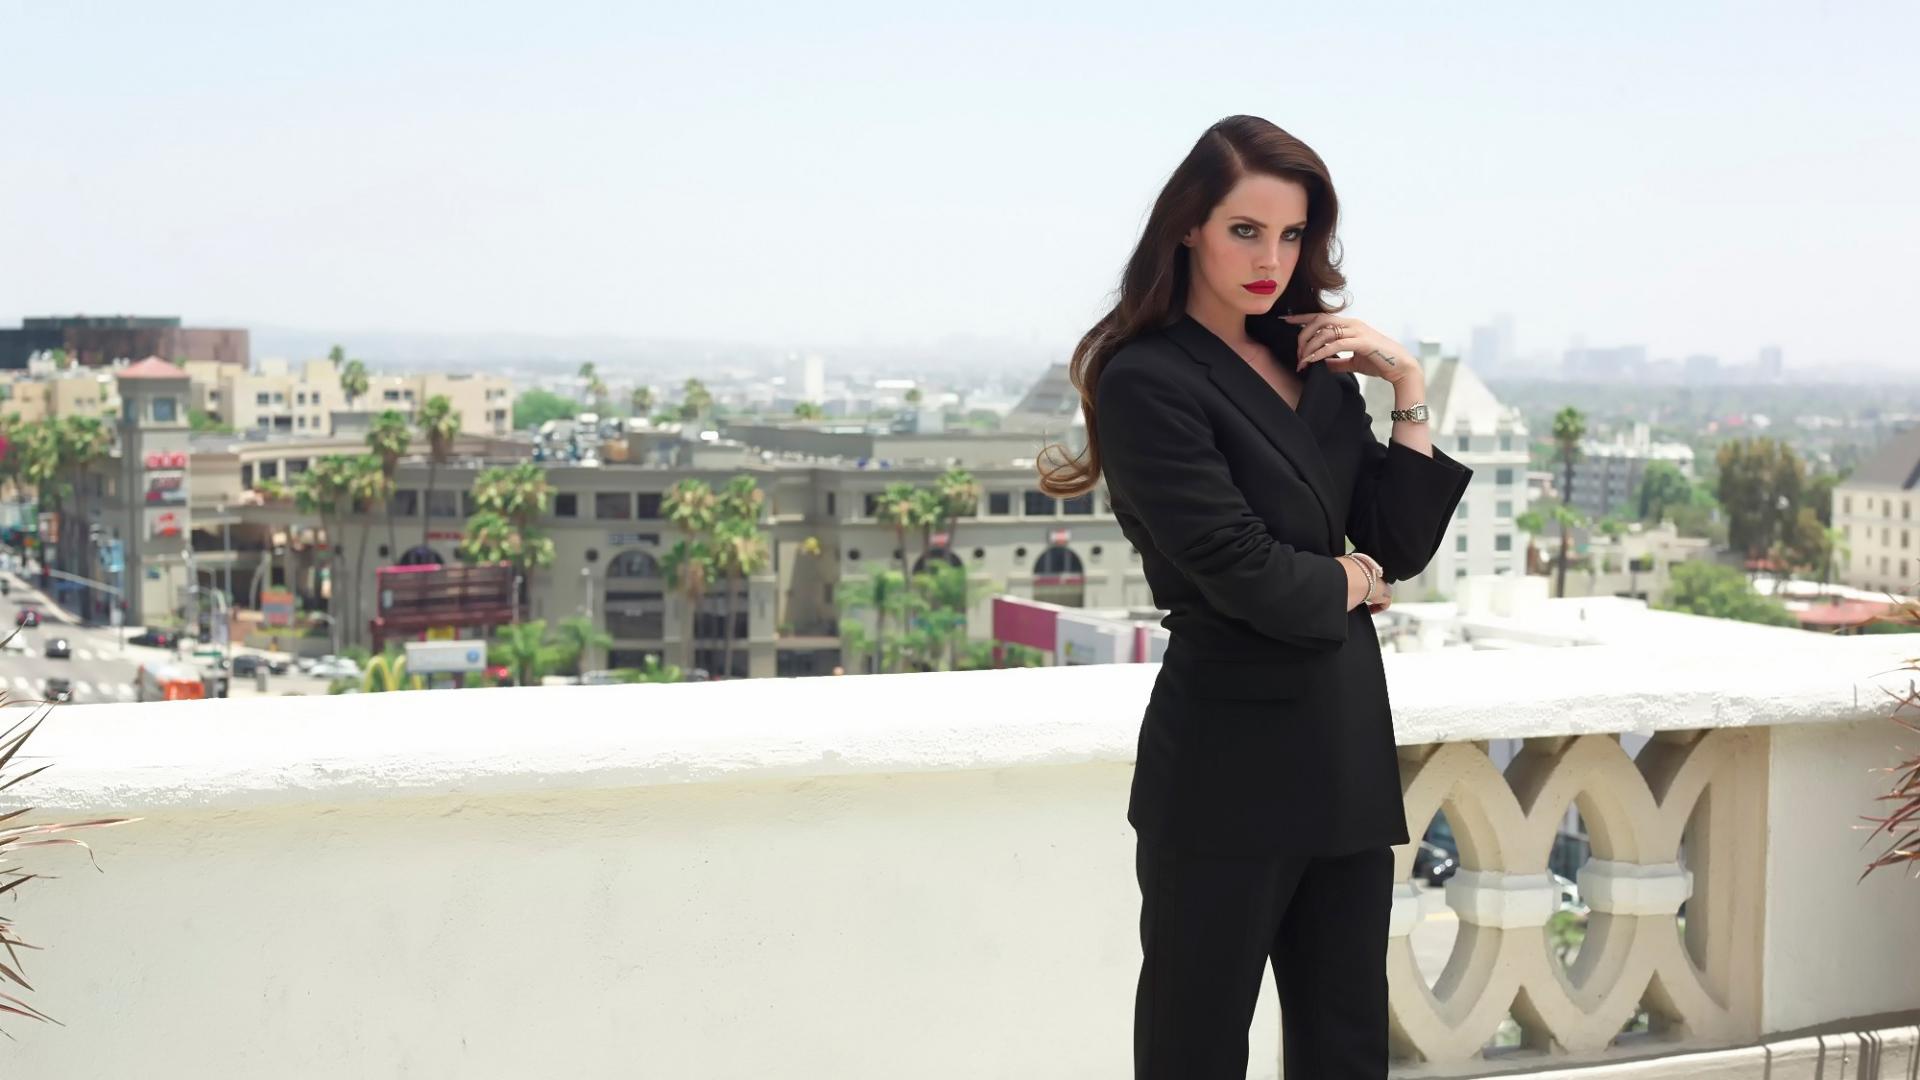 Lana Del Rey Celebrity Wallpaper 53284 1920x1080px